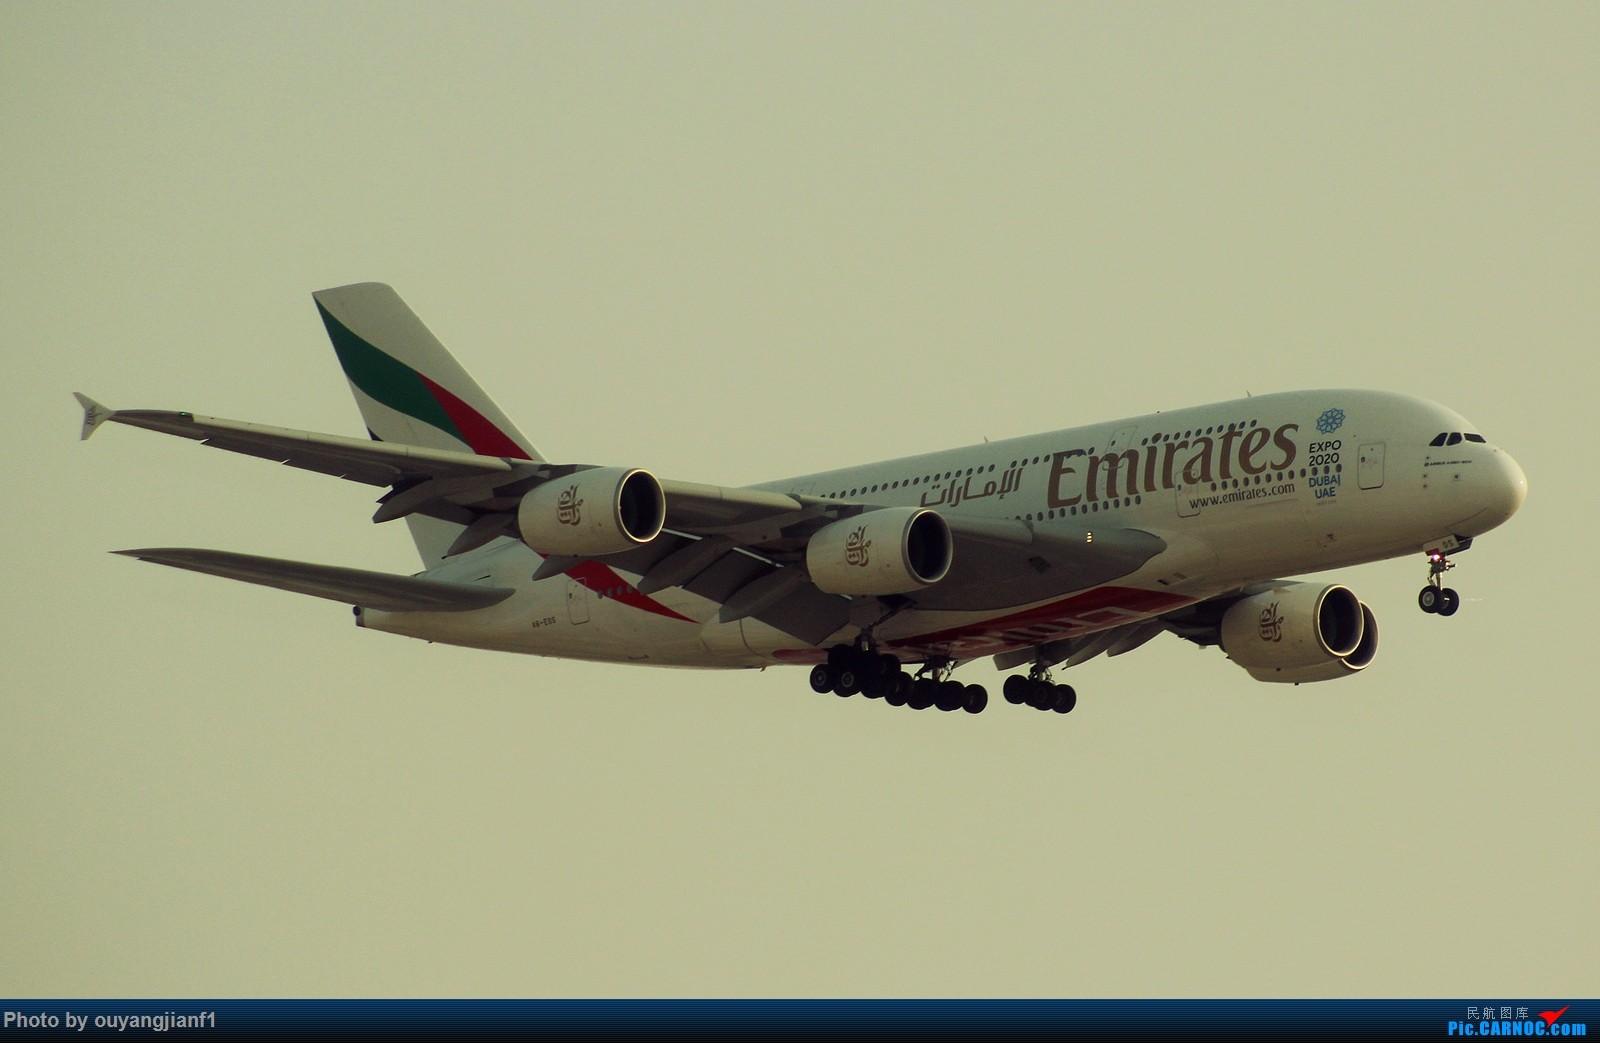 Re:[原创]很多年没有来贴图区了,记一次本不在计划中的迪拜拍机之行,在漫天黄沙中EK的380和777真的看到吐血.... AIRBUS A380-800 A6-EOS 阿拉伯联合酋长国迪拜国际机场